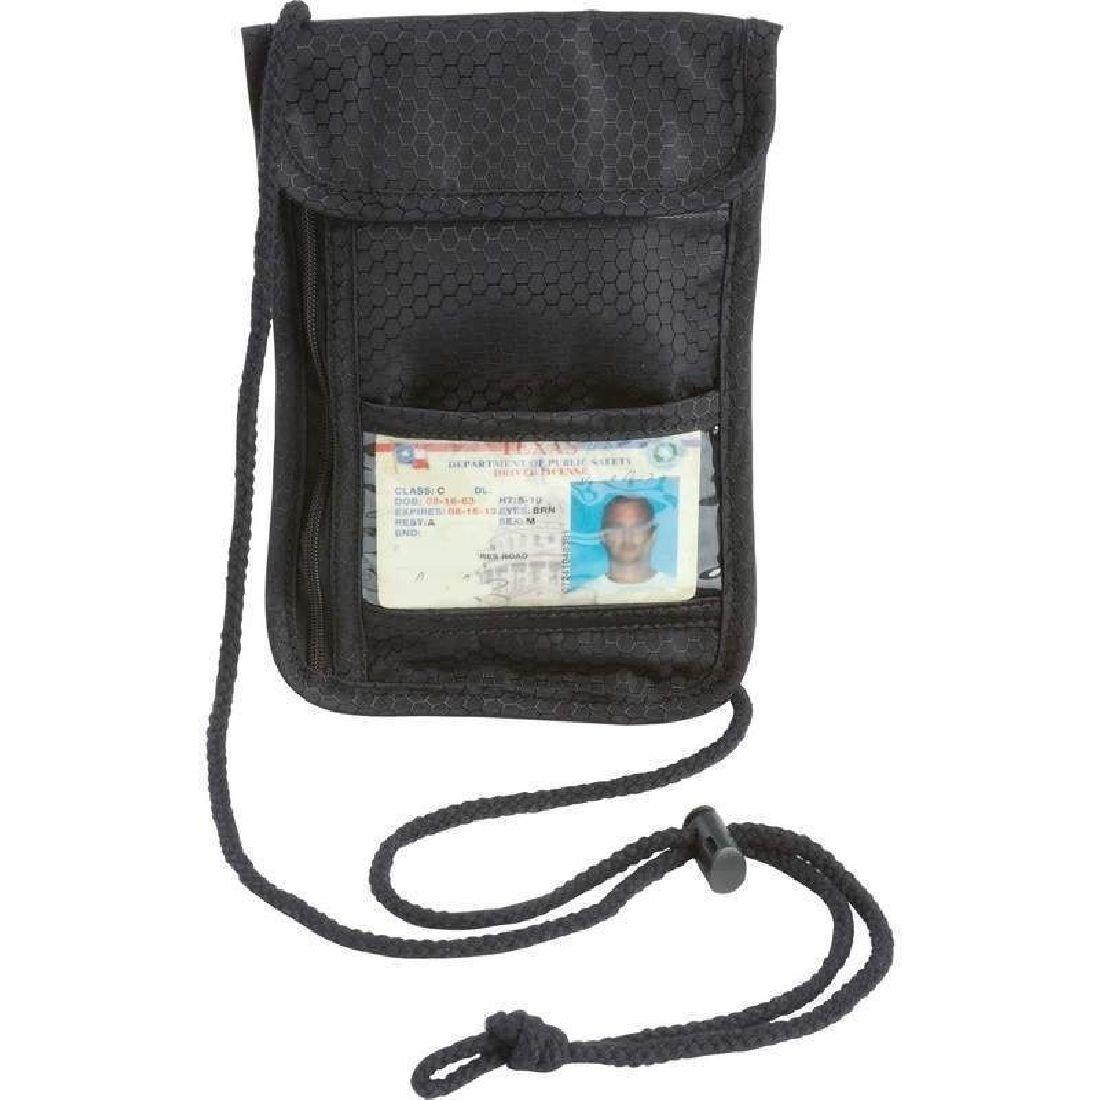 Secret Security Neck Strap Bag Hidden Passport Case Travel Wallet Money Holder